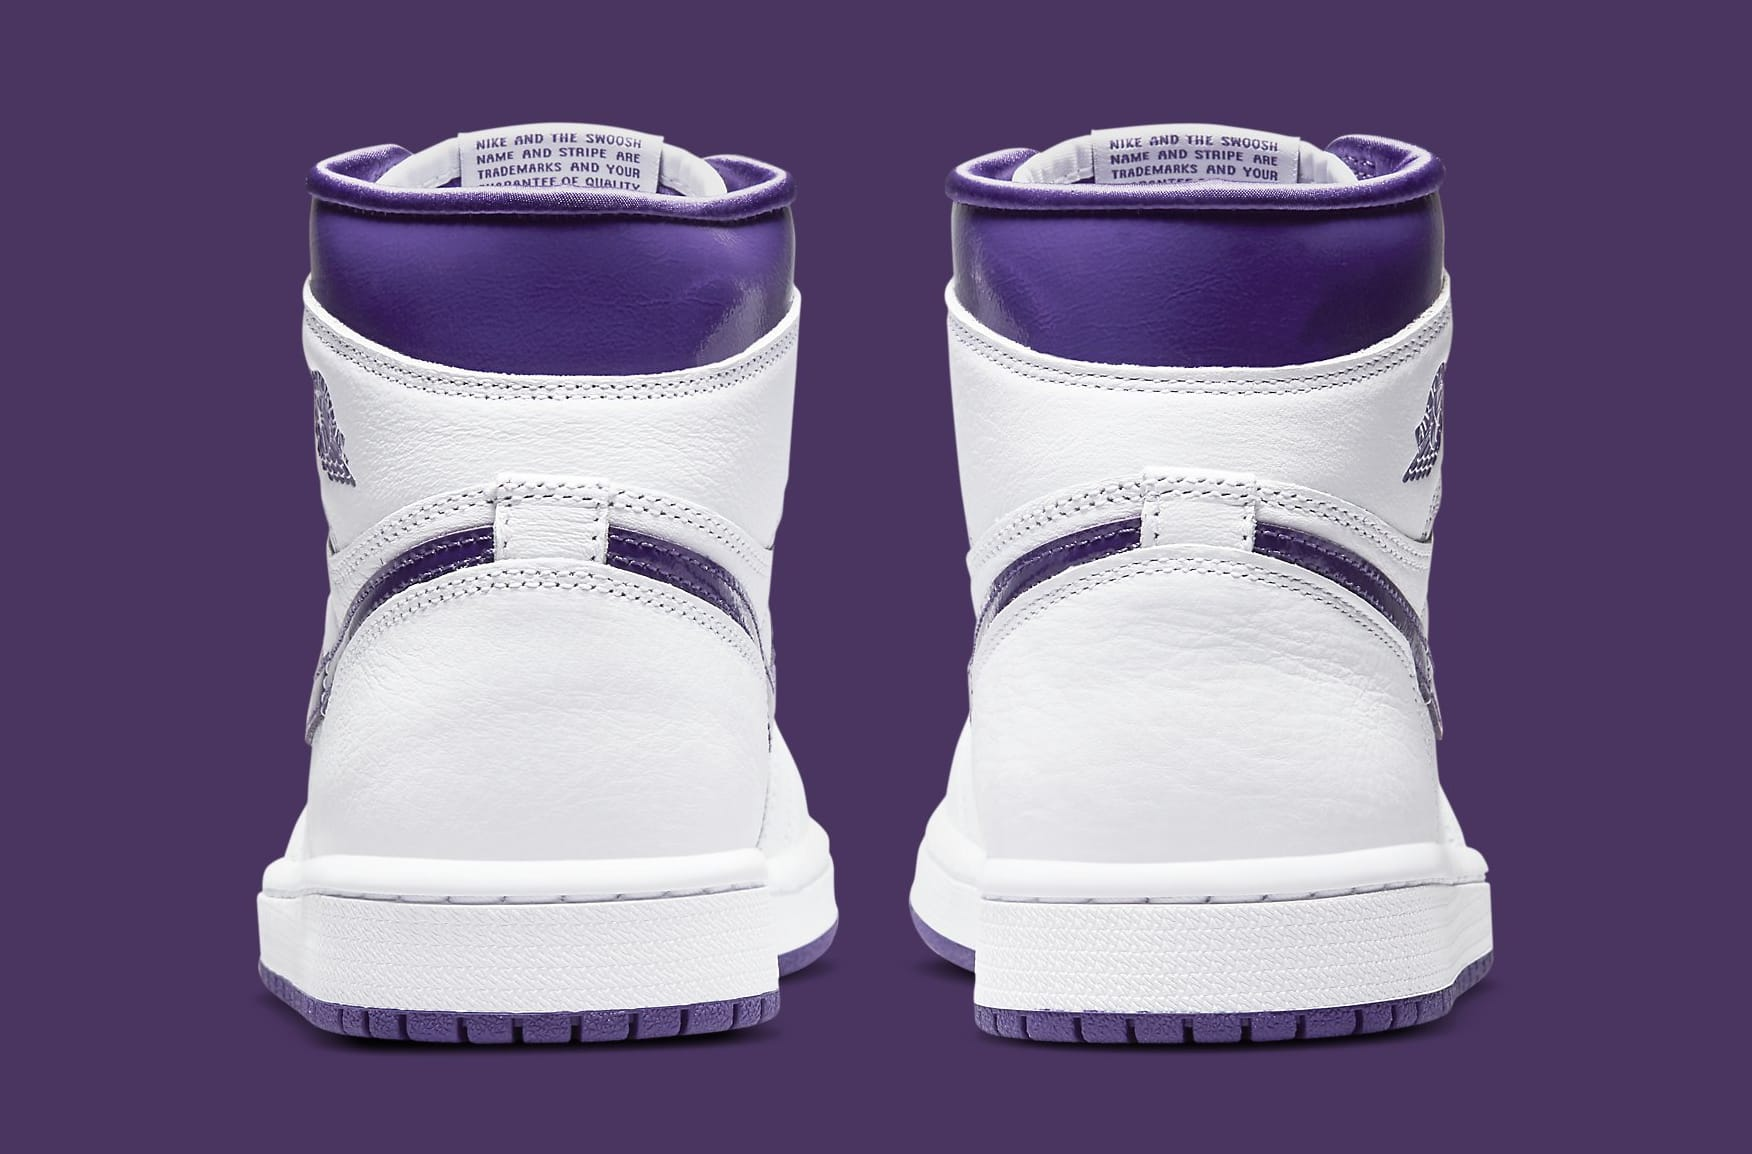 Air Jordan 1 Retro High OG Women's 'Court Purple' CD0461-151 Heel